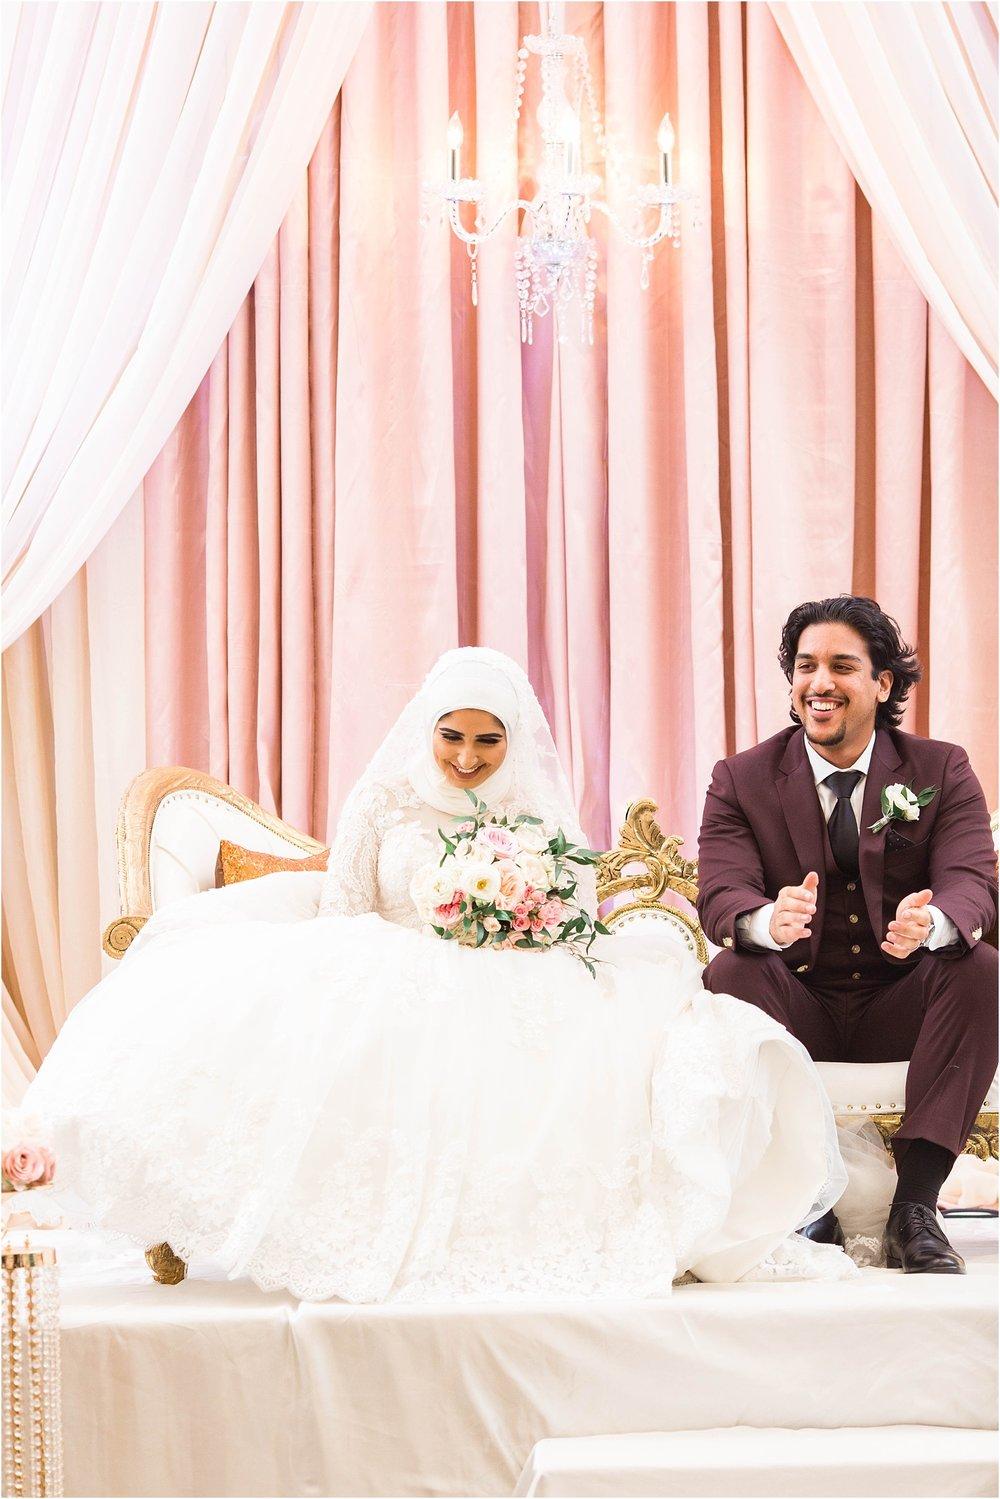 Red-Rose-Convention-Mint-Room-Wedding-Toronto-Mississauga-Brampton-Scarborough-GTA-Pakistani-Indian-Wedding-Engagement-Photographer-Photography_0132.jpg